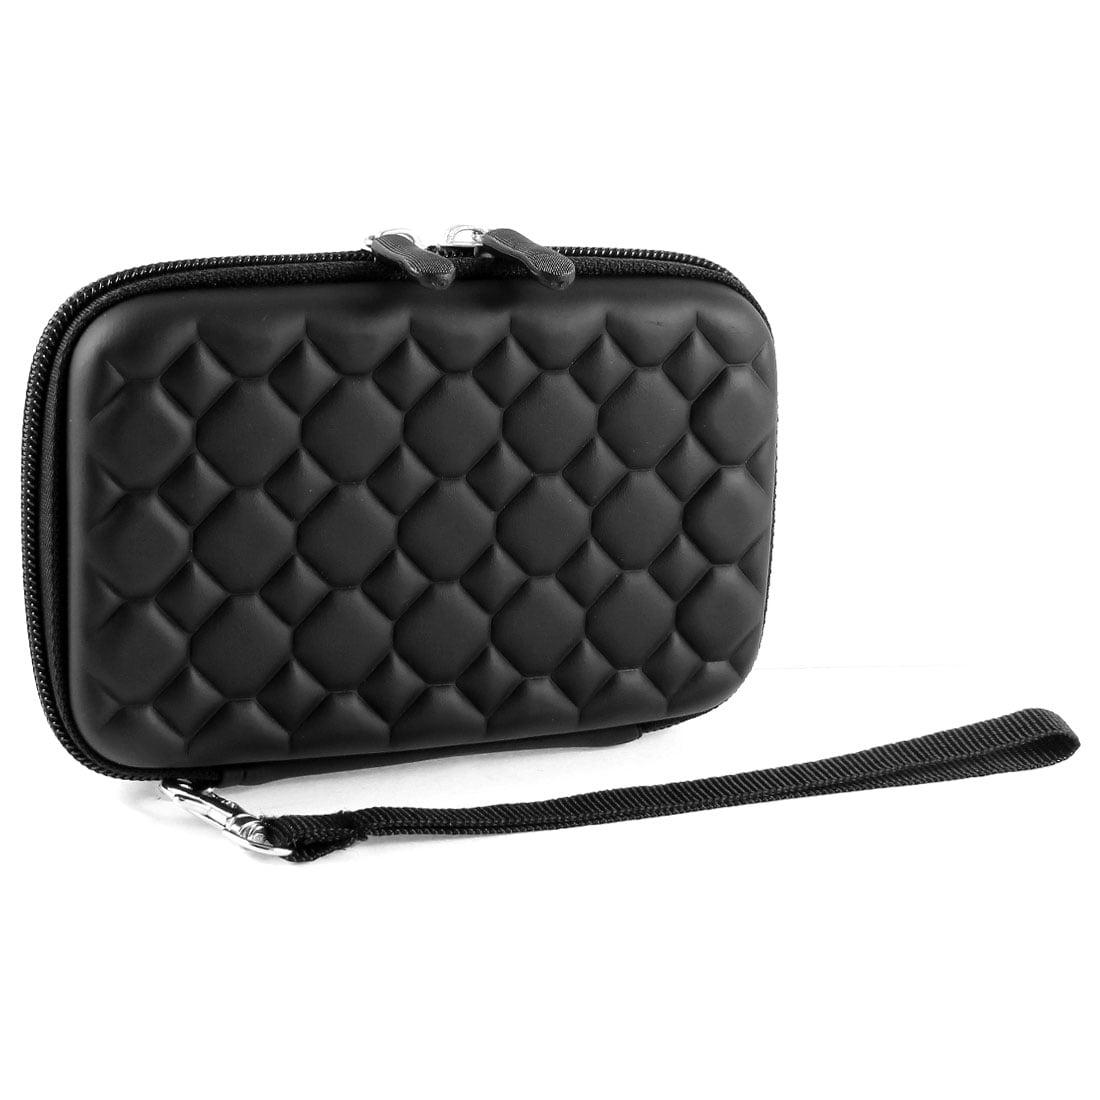 Unique Bargains Black EVA Protable 2.5 Inch External HDD Hard Disk Drive Protect Case Bag Pouch